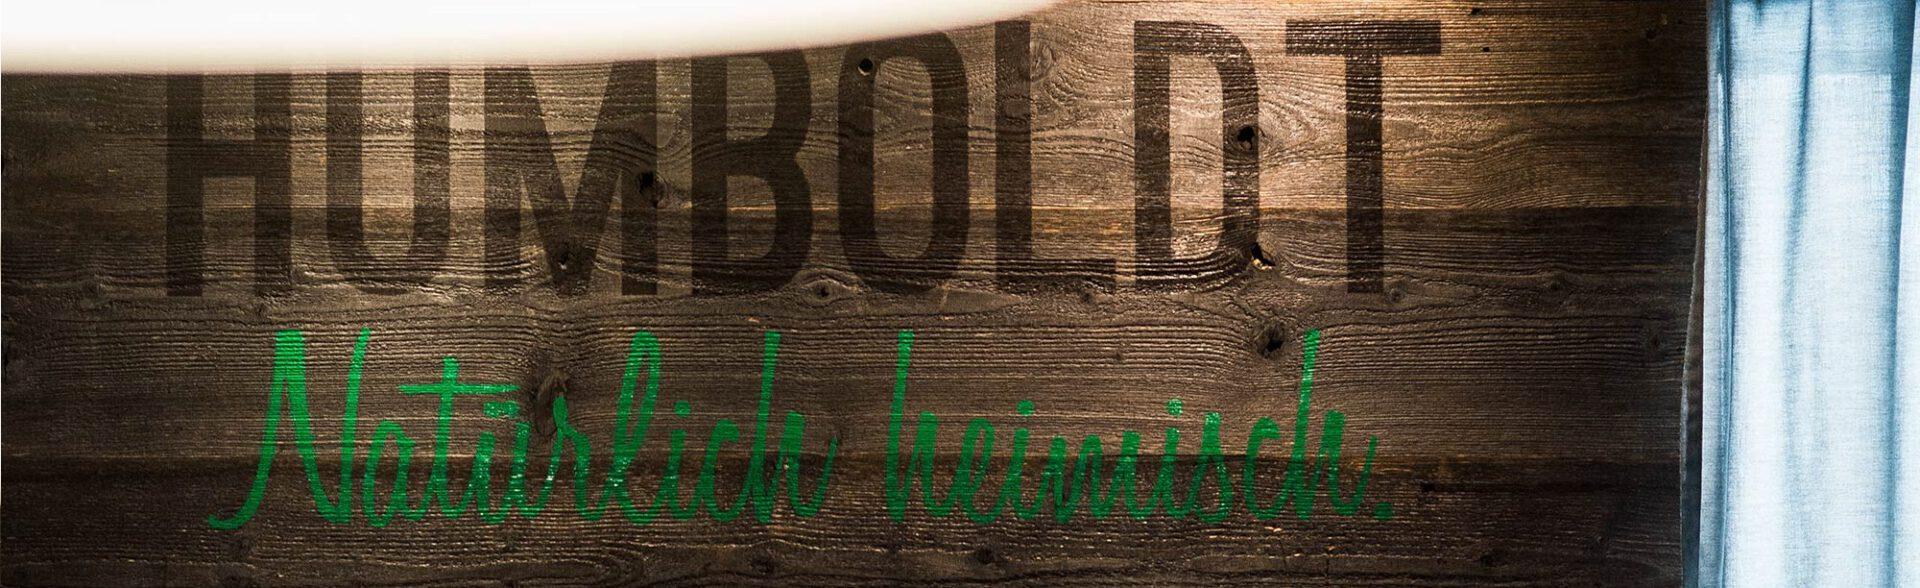 Banner Humboldtstubn